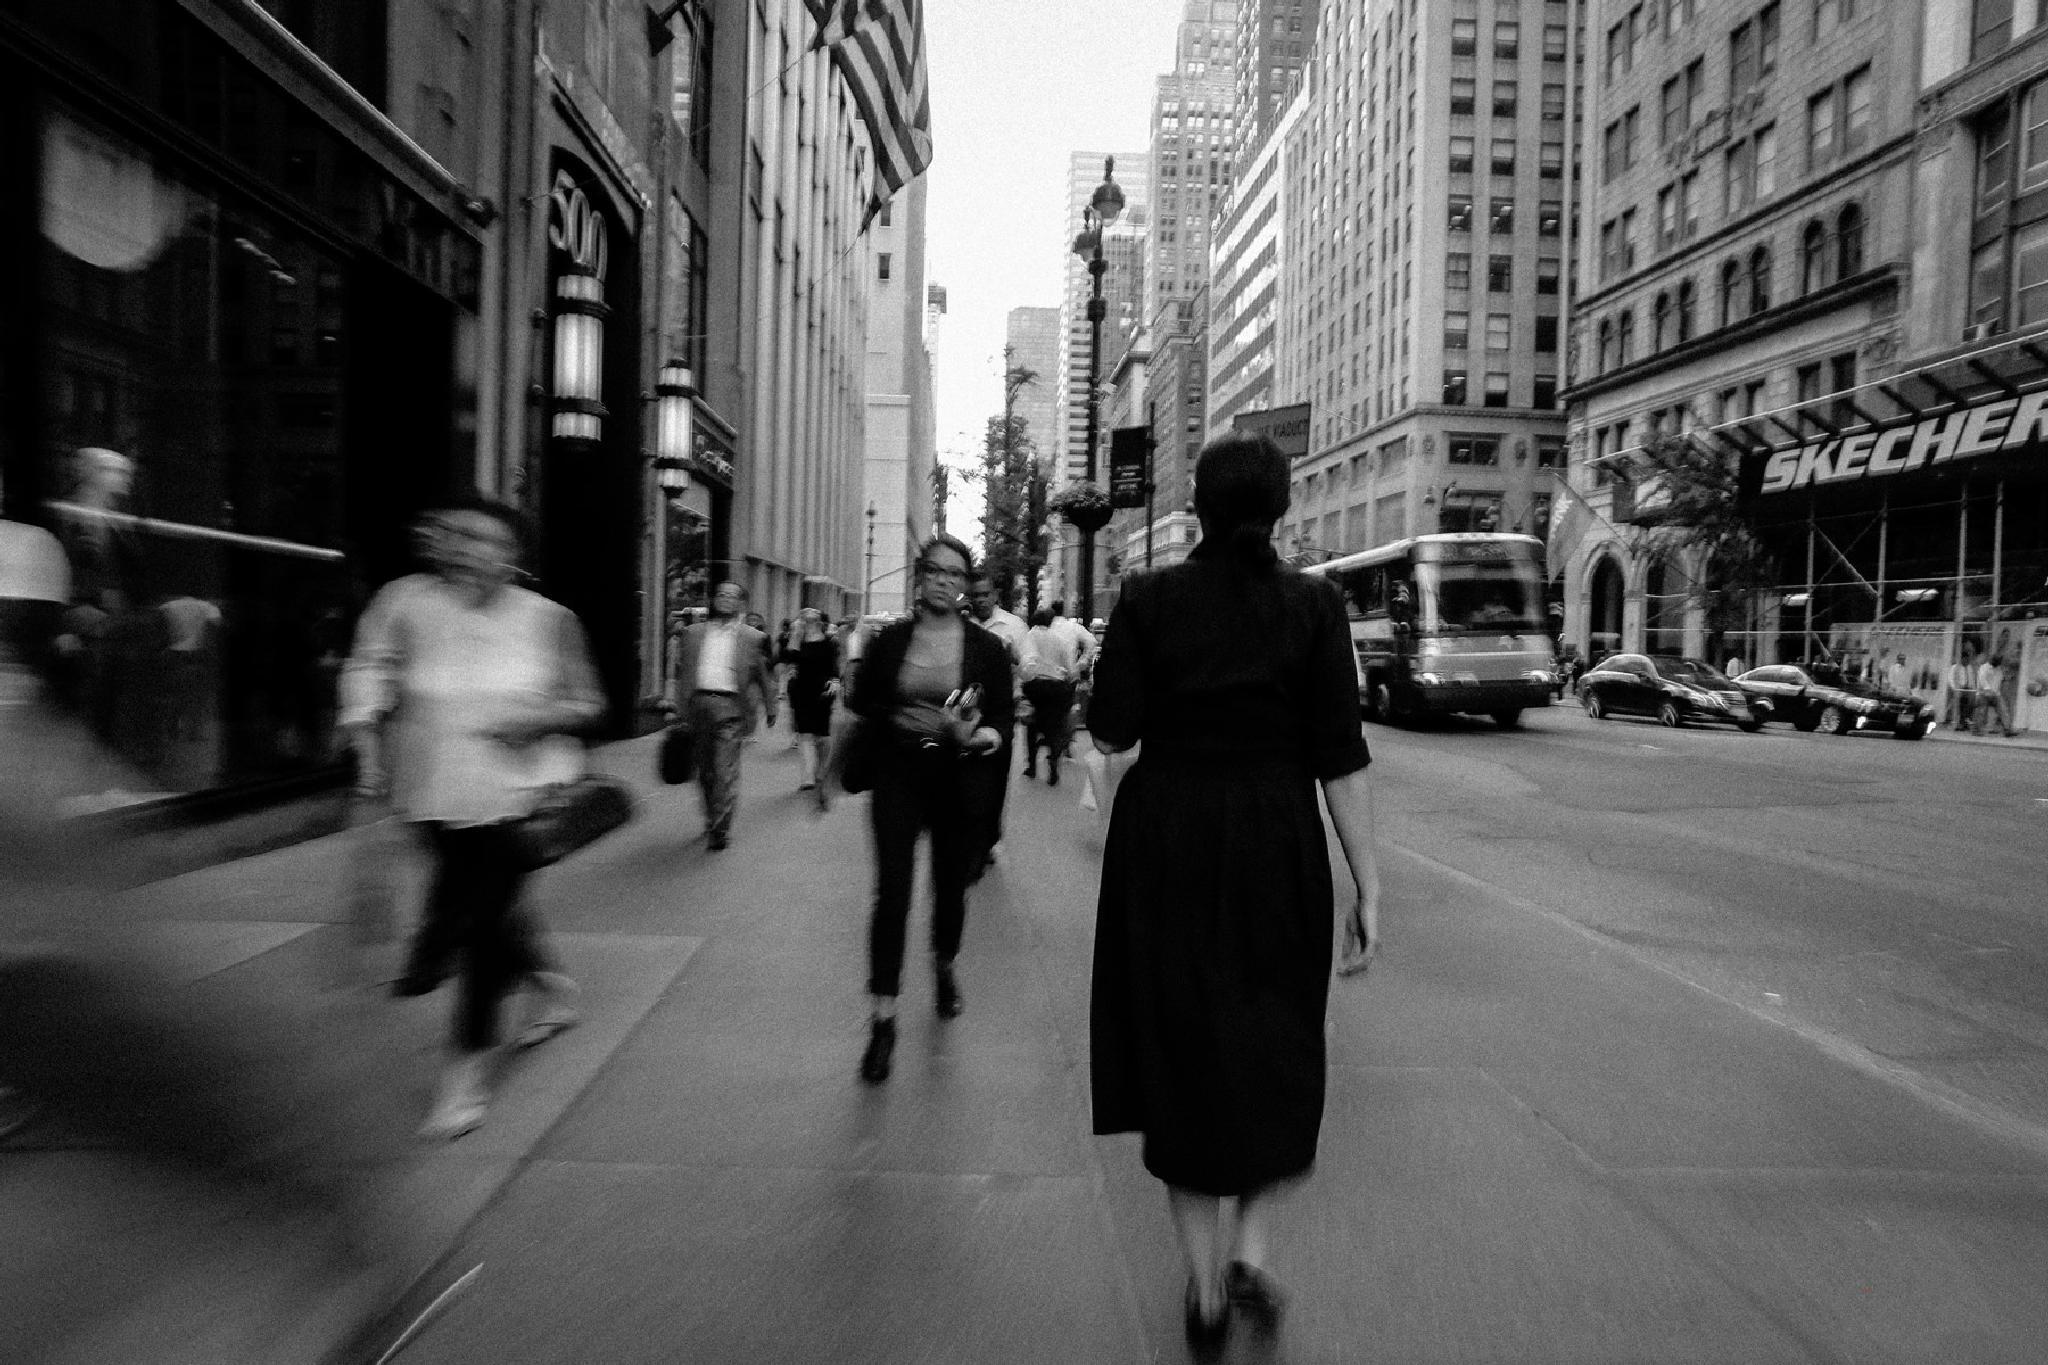 Walking in New York by giovannicasalefotografo